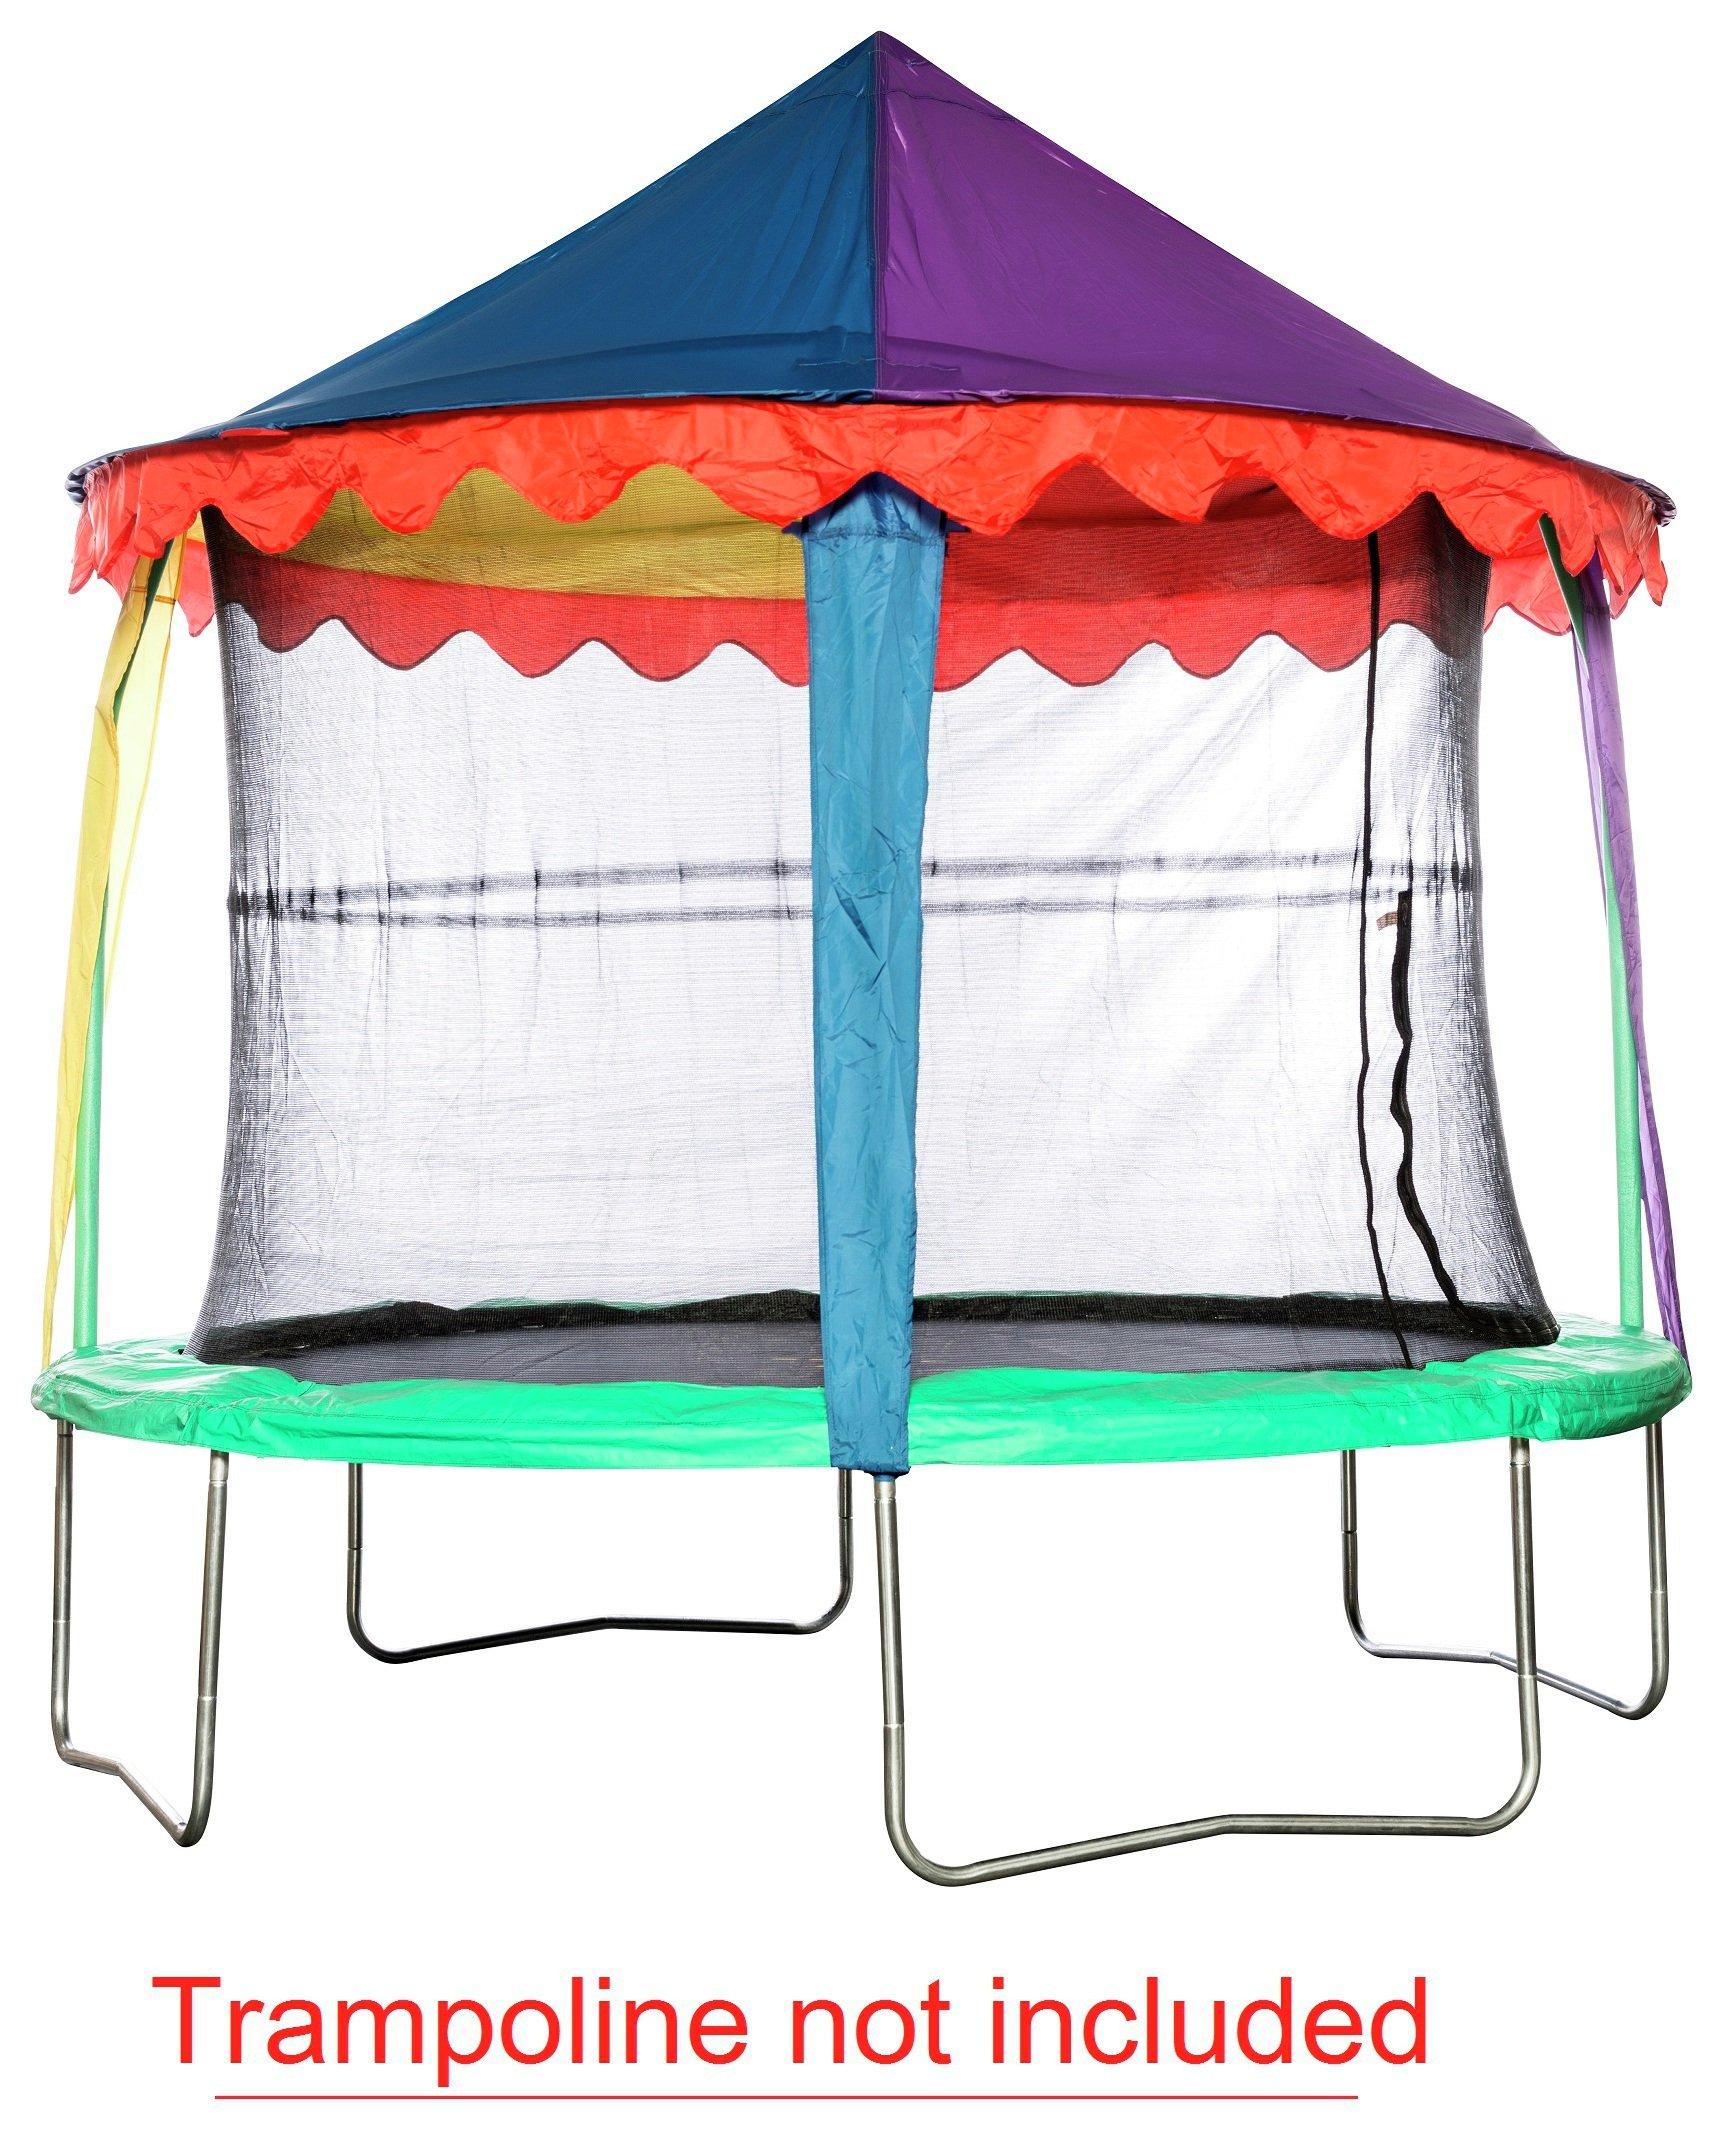 Jumpking 12ft Circus Tent Canopy